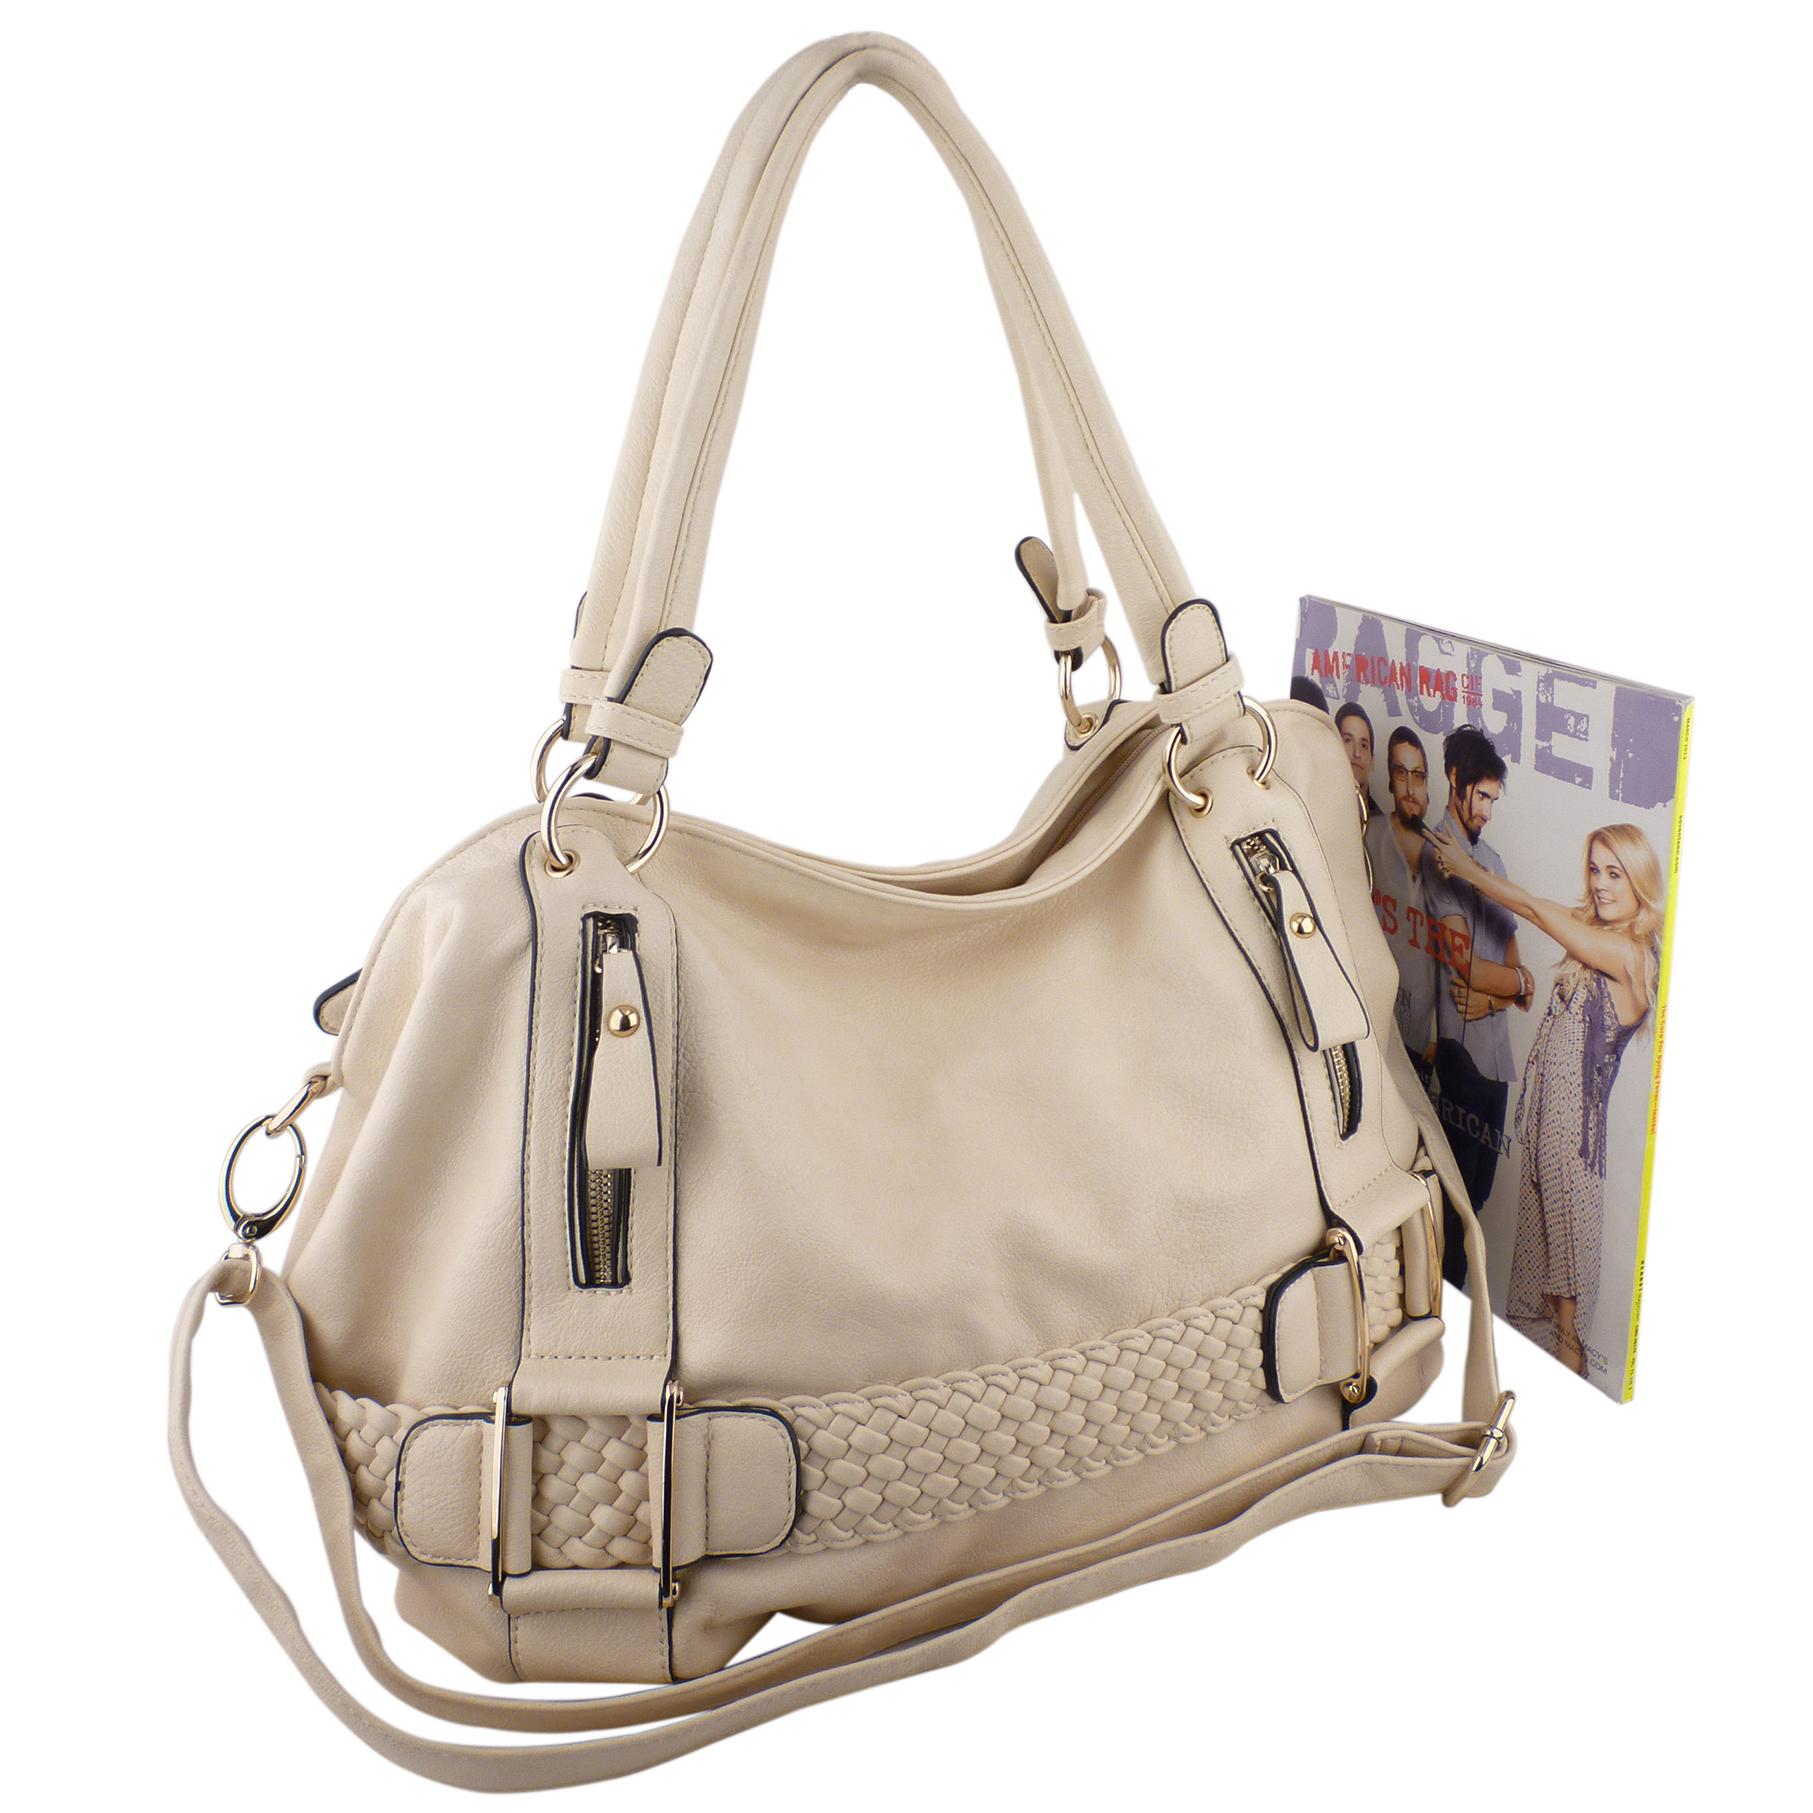 SAMANTHA Cream Weave Pattern Soft Hobo Handbag Size